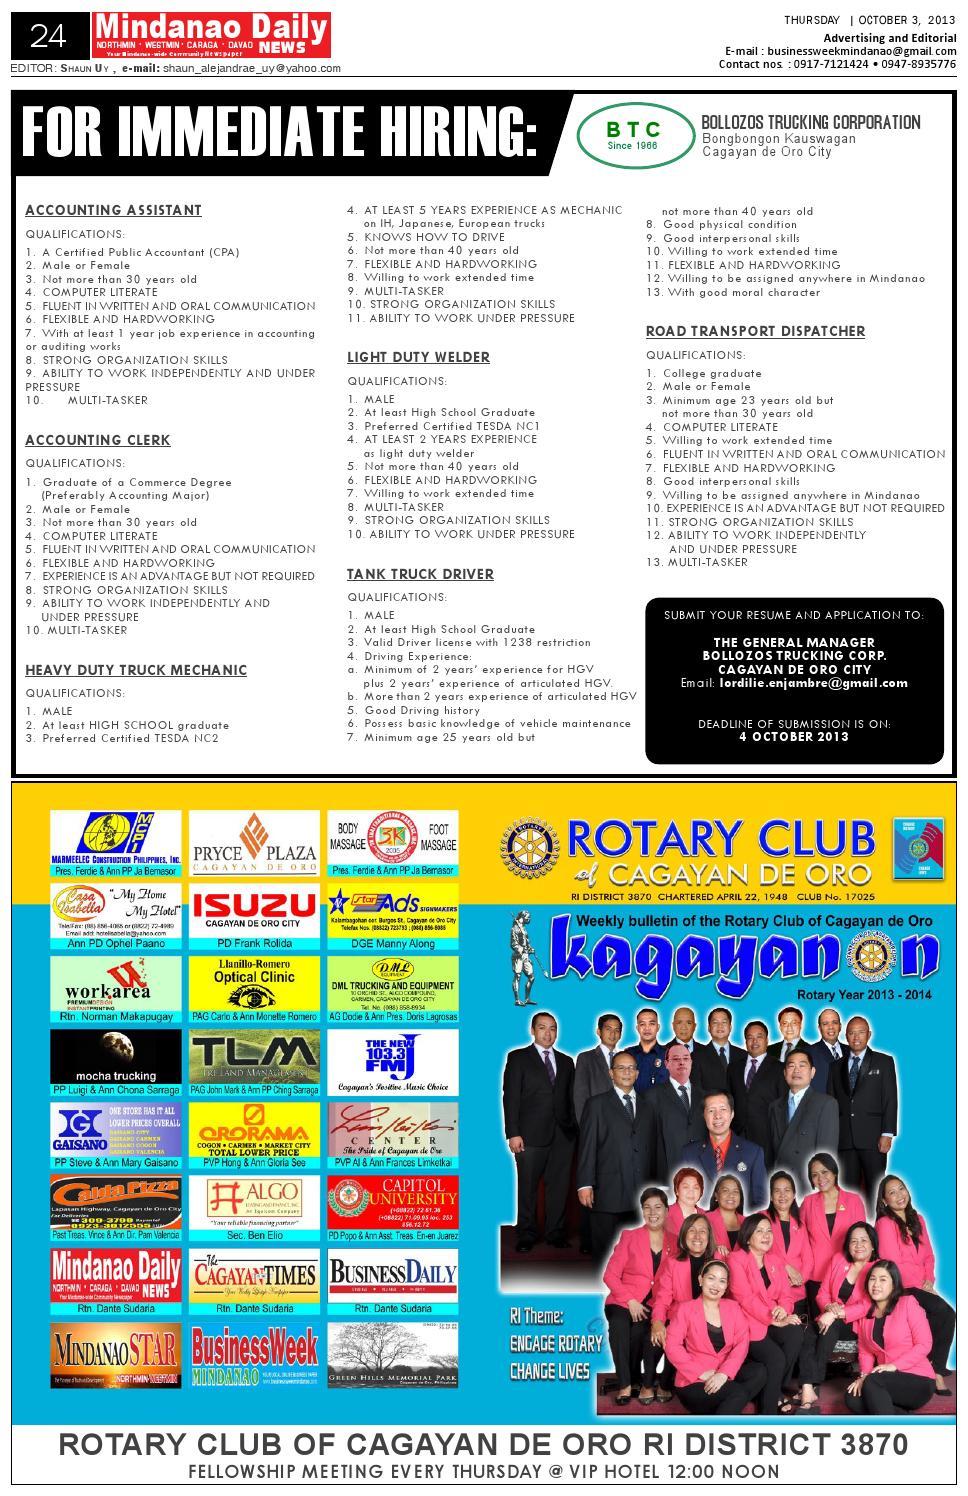 BusinessWeek Mindanao (October 3, 2013) by Mindanao Daily